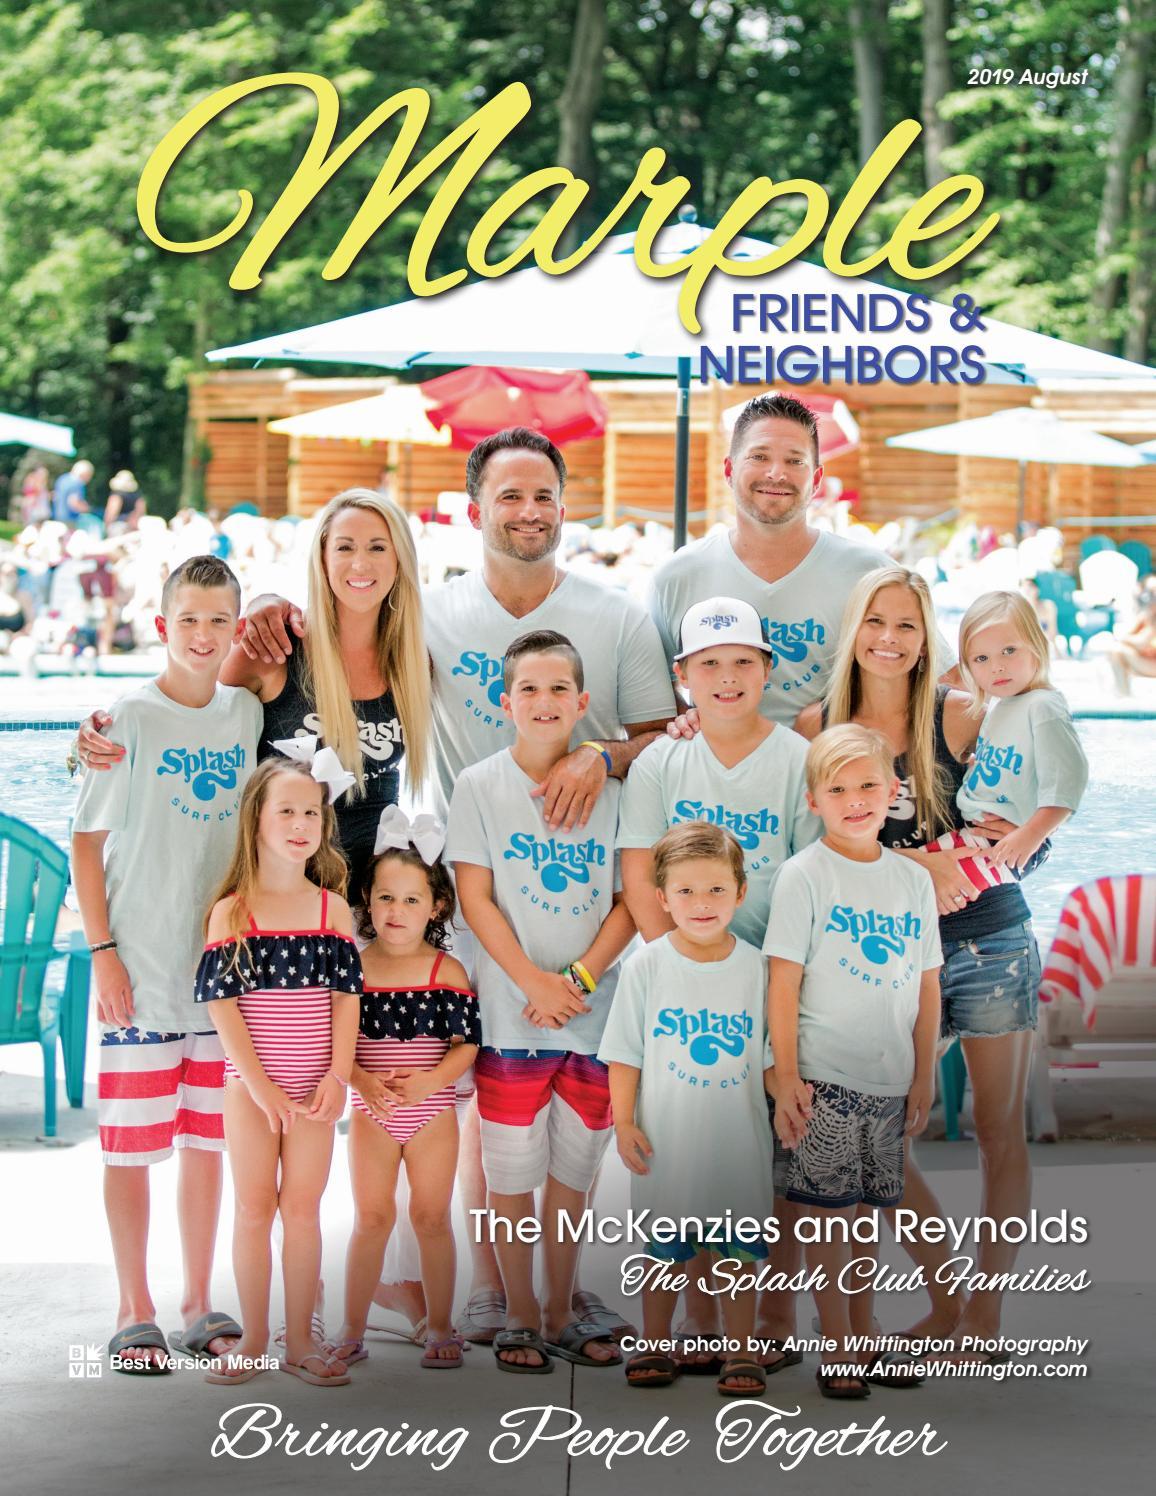 Marple Friends & Neighbors magazine August 2019 by